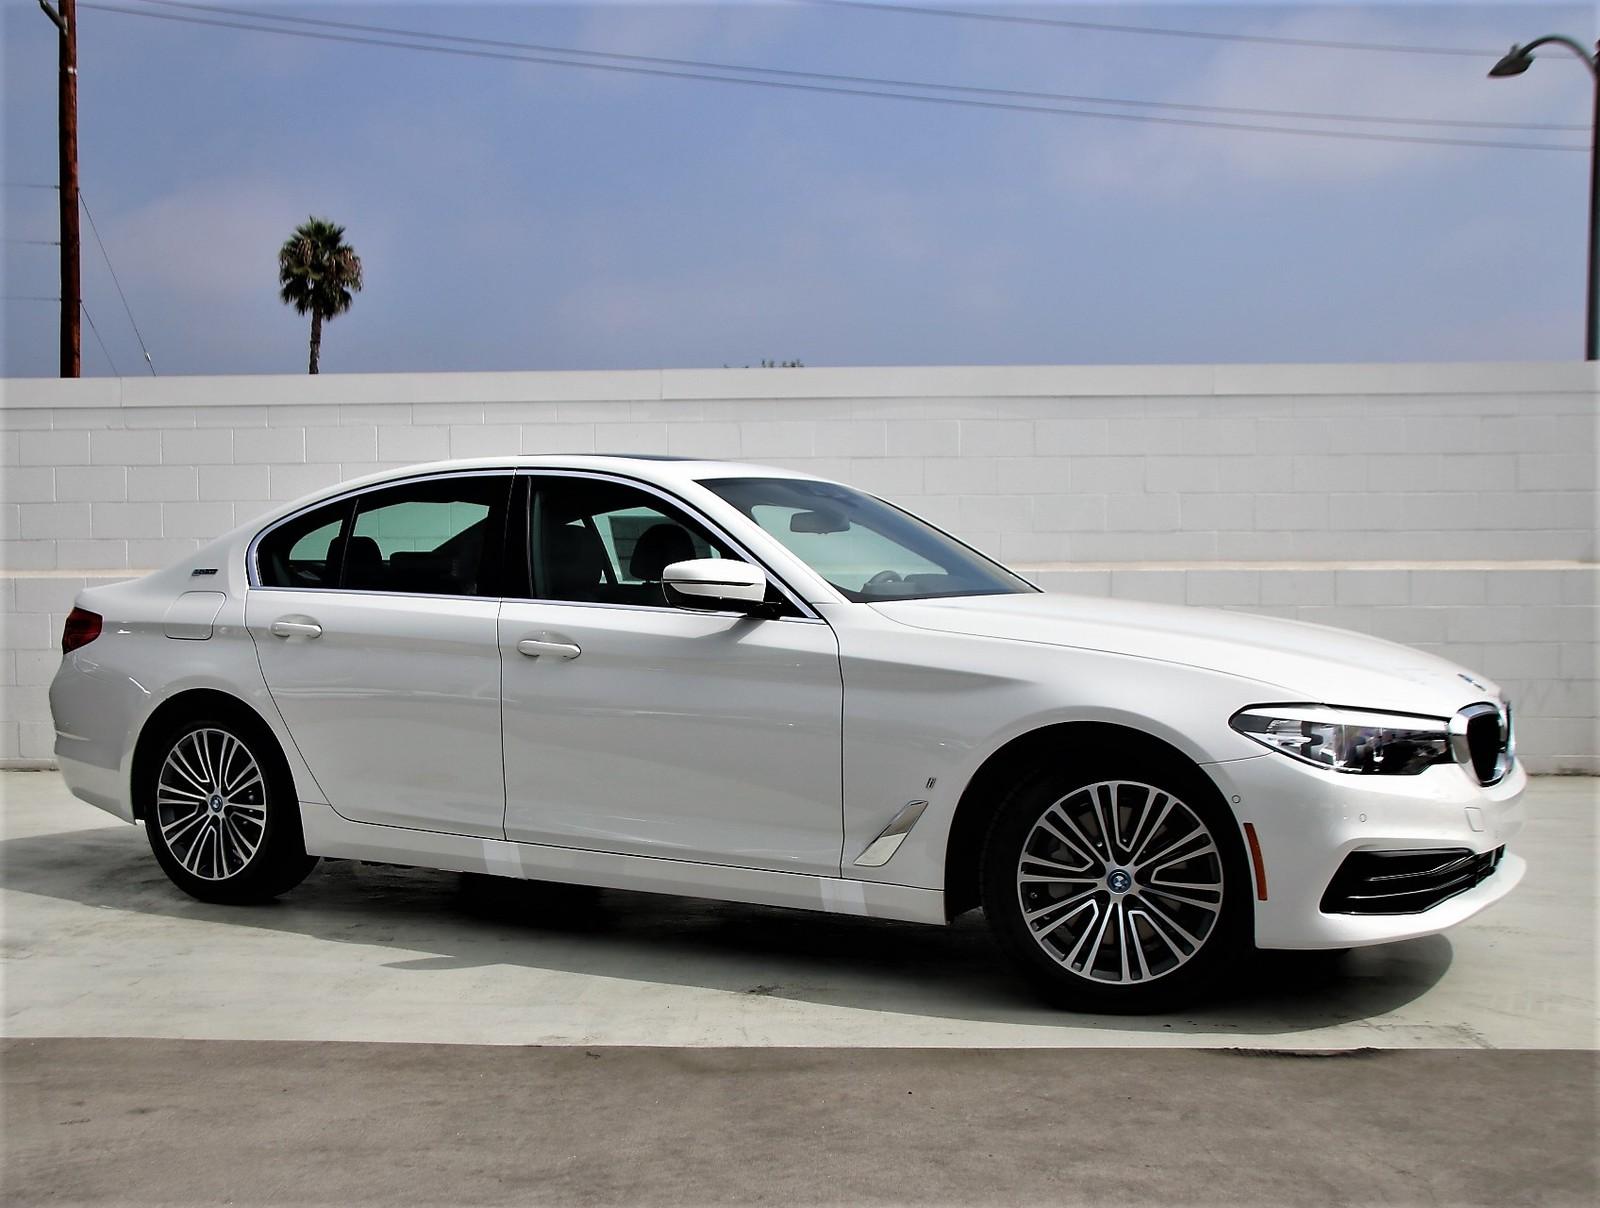 2020 BMW 5 Series Lease $529   $0 Down